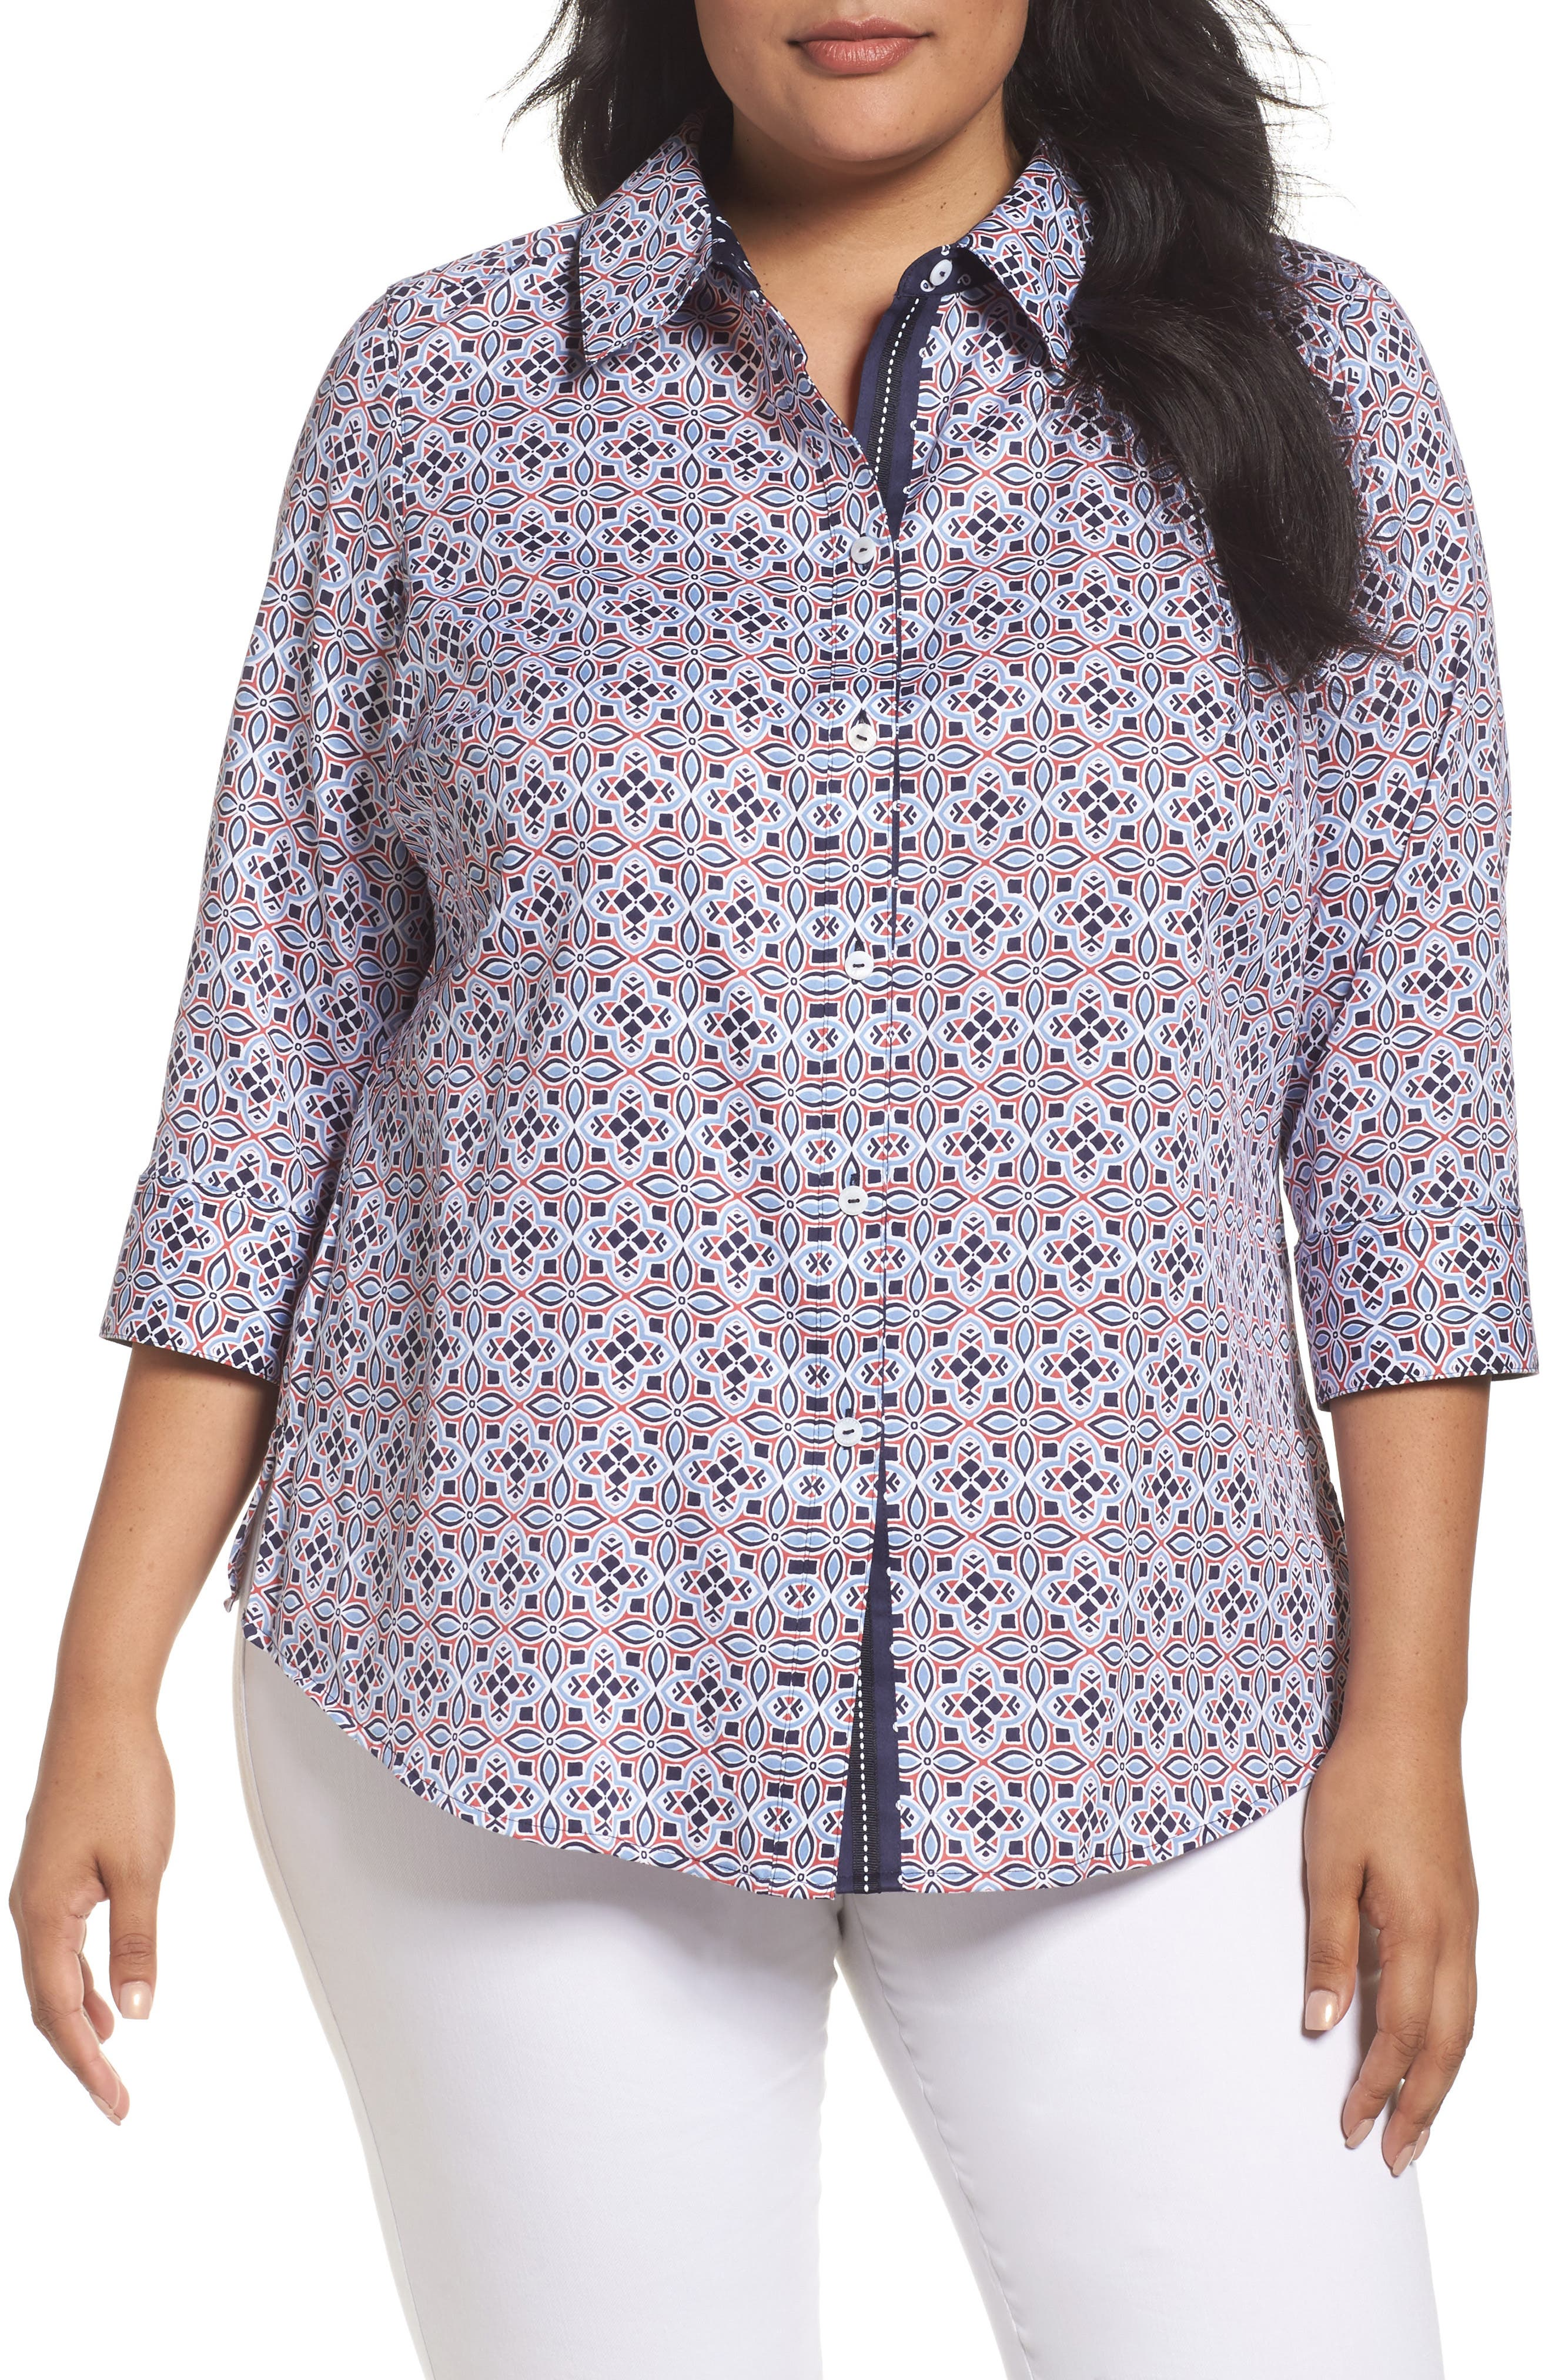 Alternate Image 1 Selected - Foxcroft Ava Non-Iron Tile Print Cotton Shirt (Plus Size)